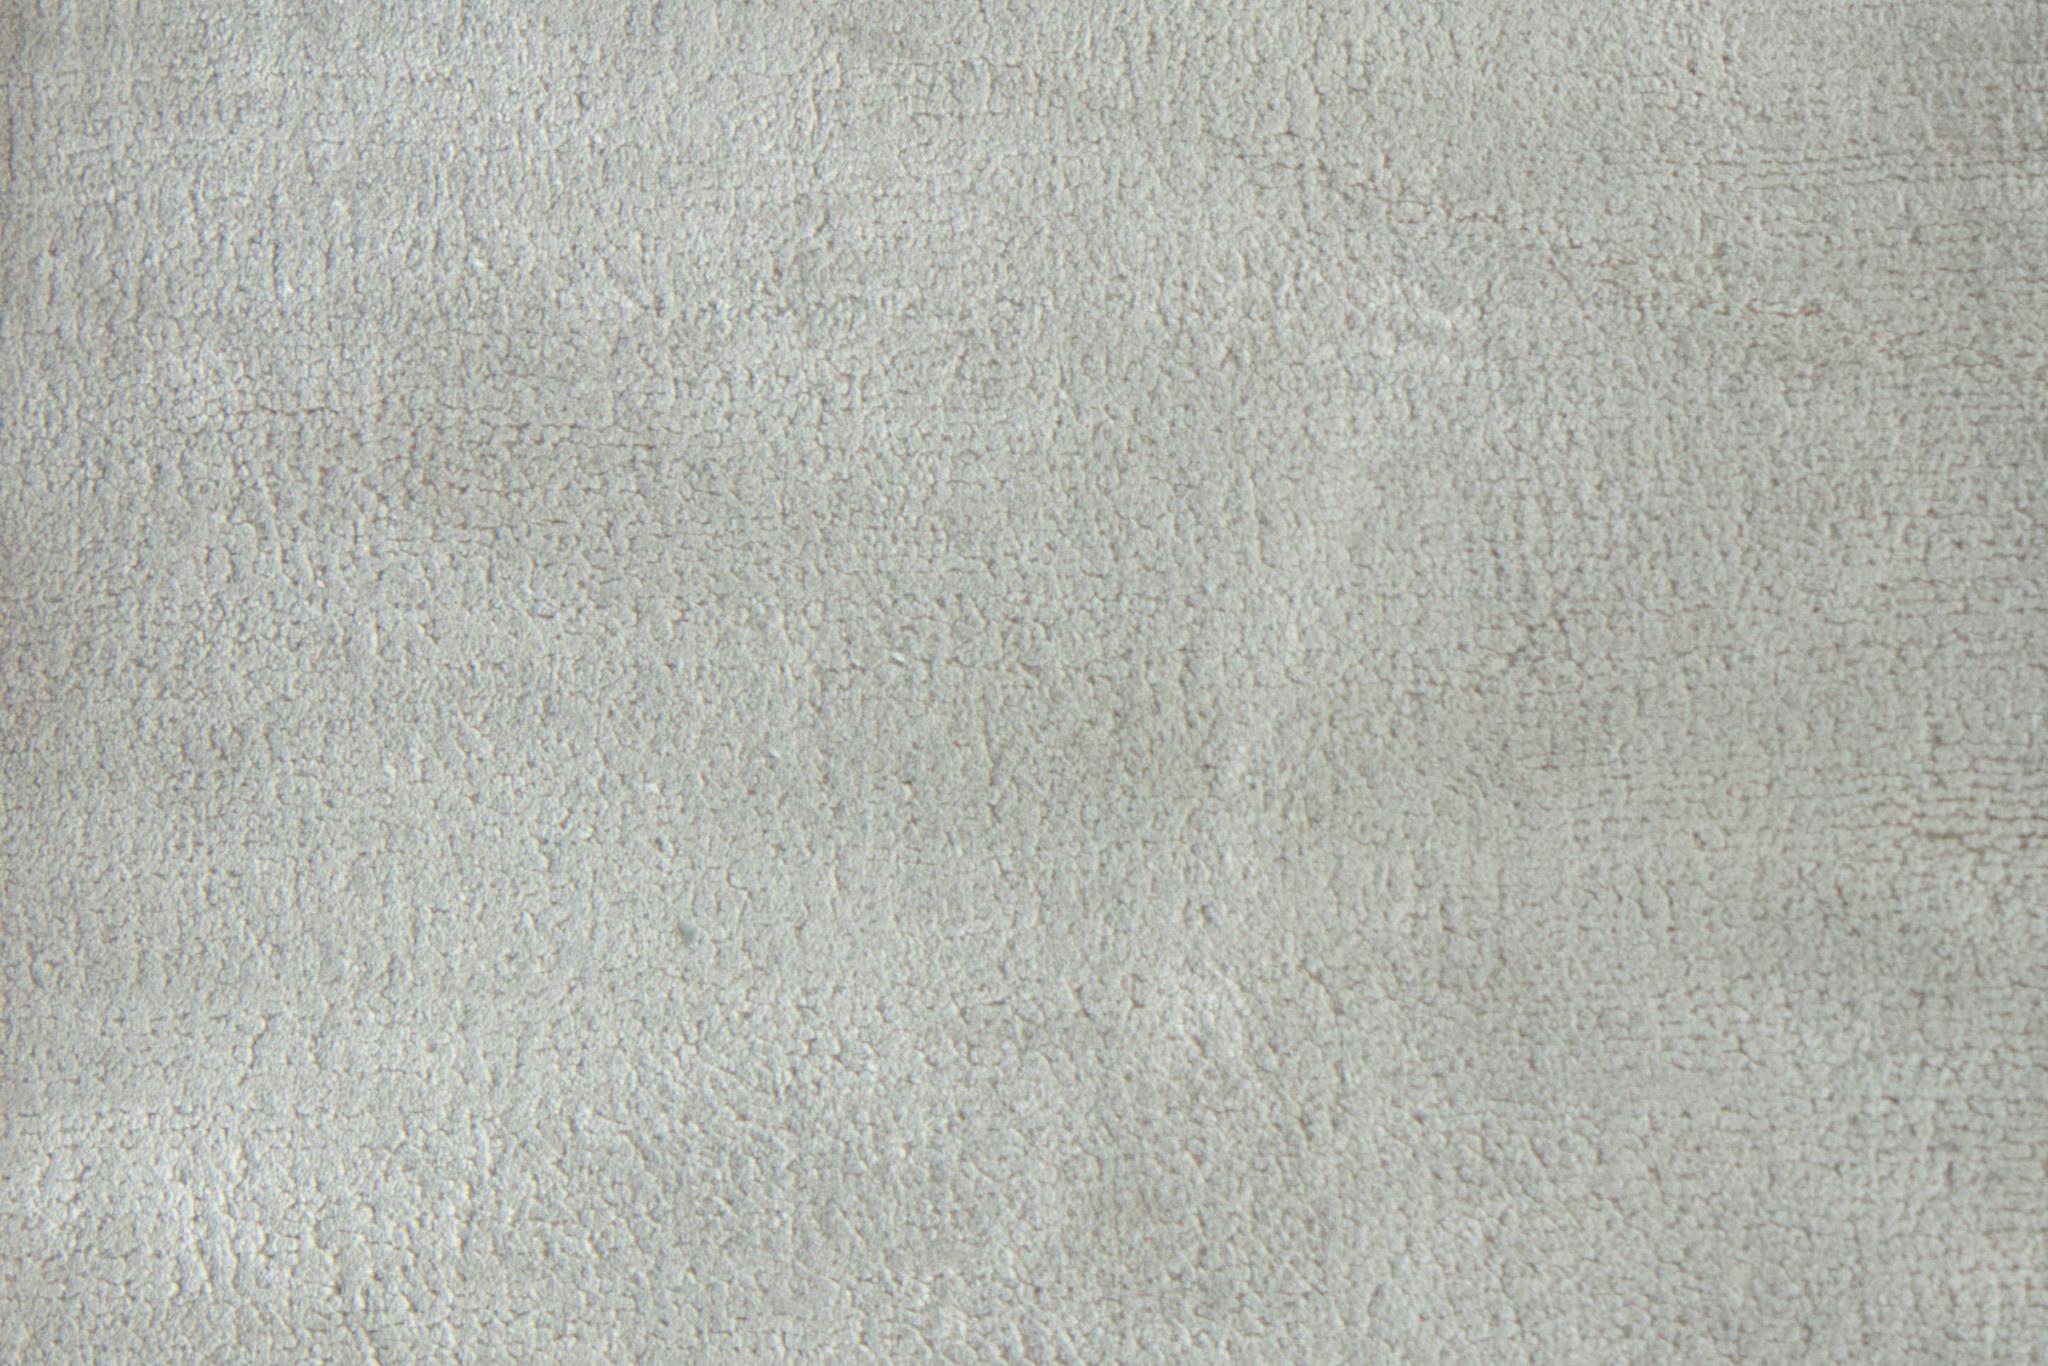 CHIANTI Carpet Silver Beige 300x400-1